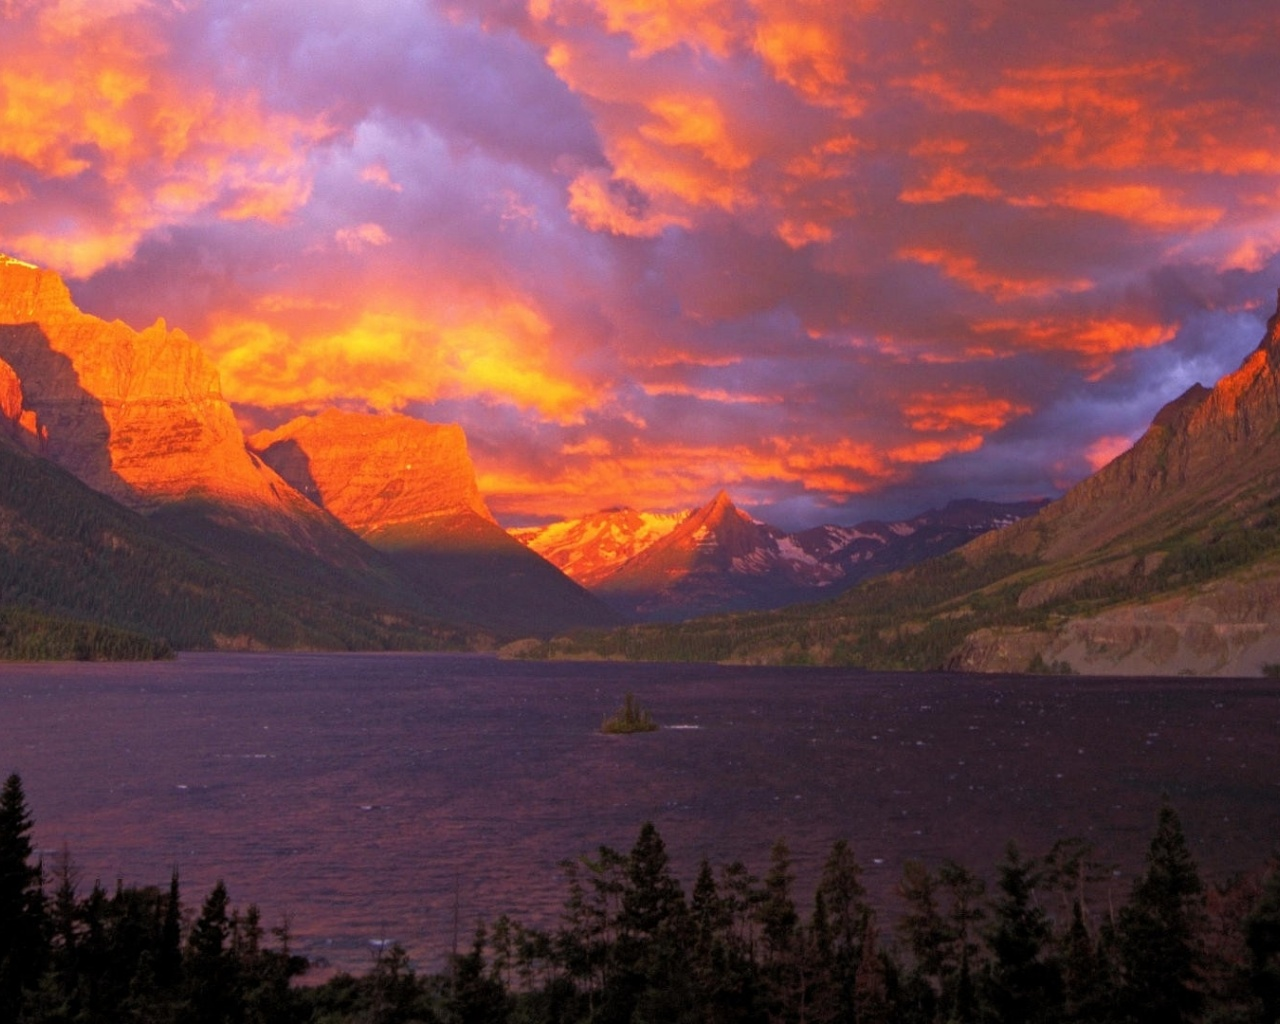 1280x1024 Montana Glacier SaintMaryLake desktop PC and Mac wallpaper 1280x1024